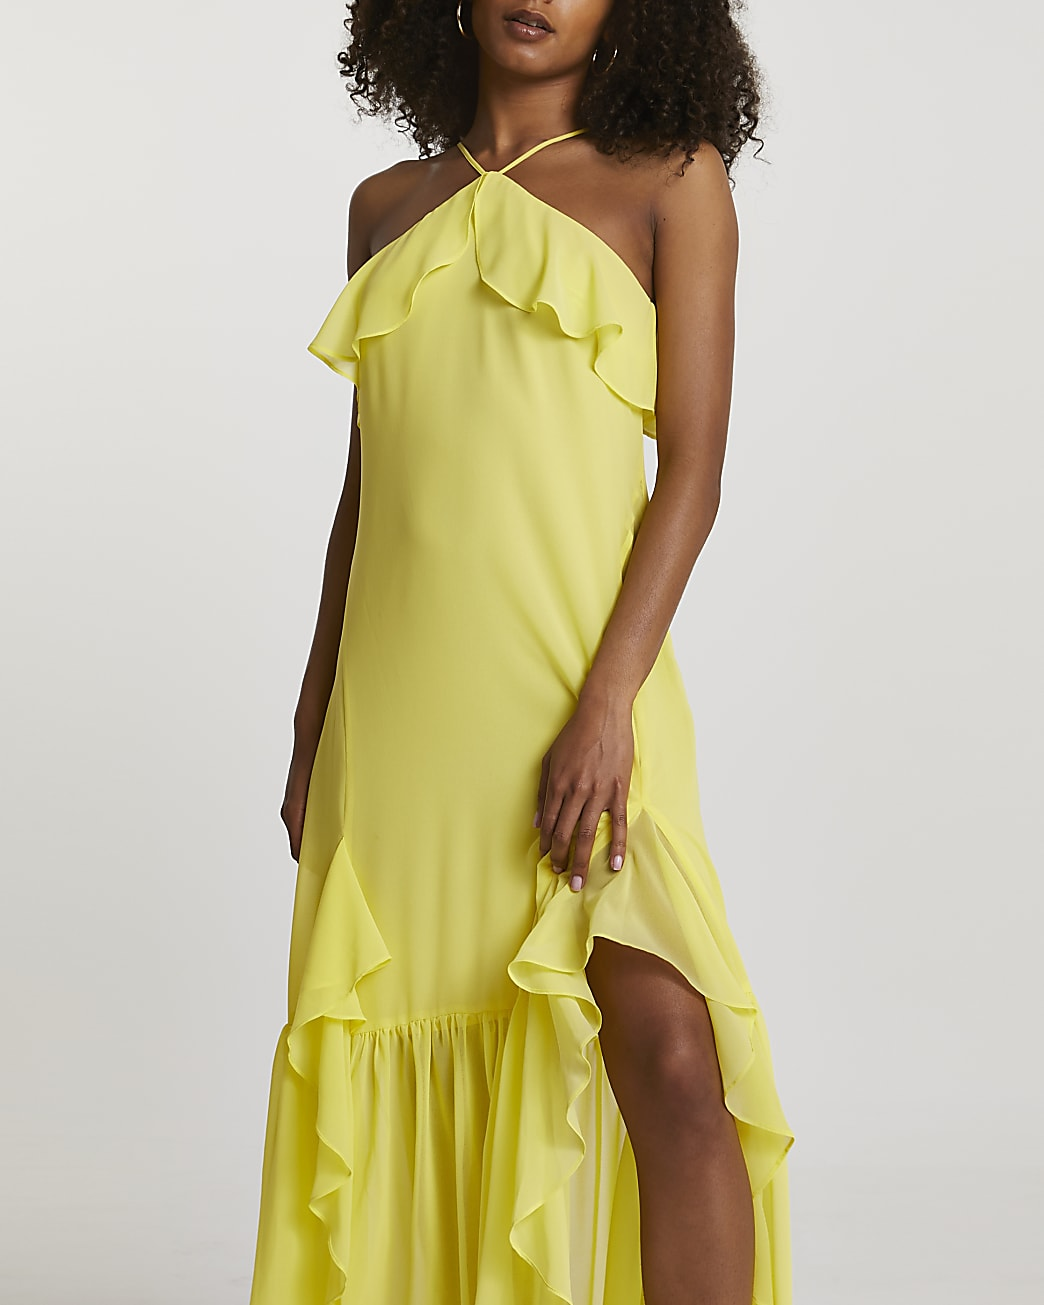 Yellow halter neck maxi dress